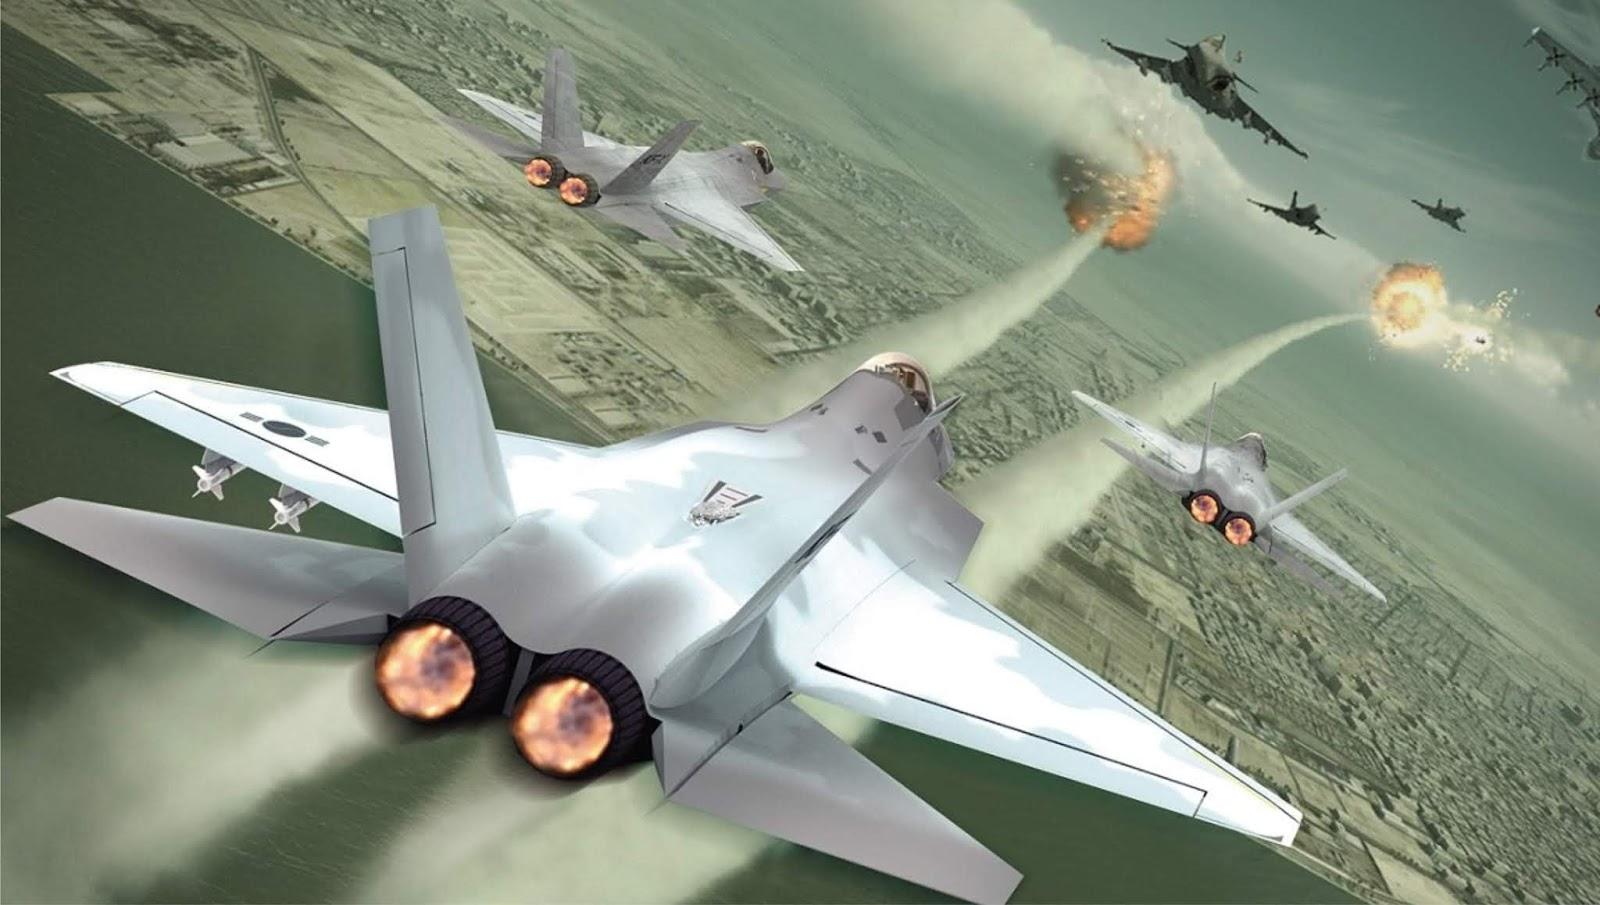 Agenda kelanjutan program kerja sama pengembangan pesawat tempur KF-X/IF-X